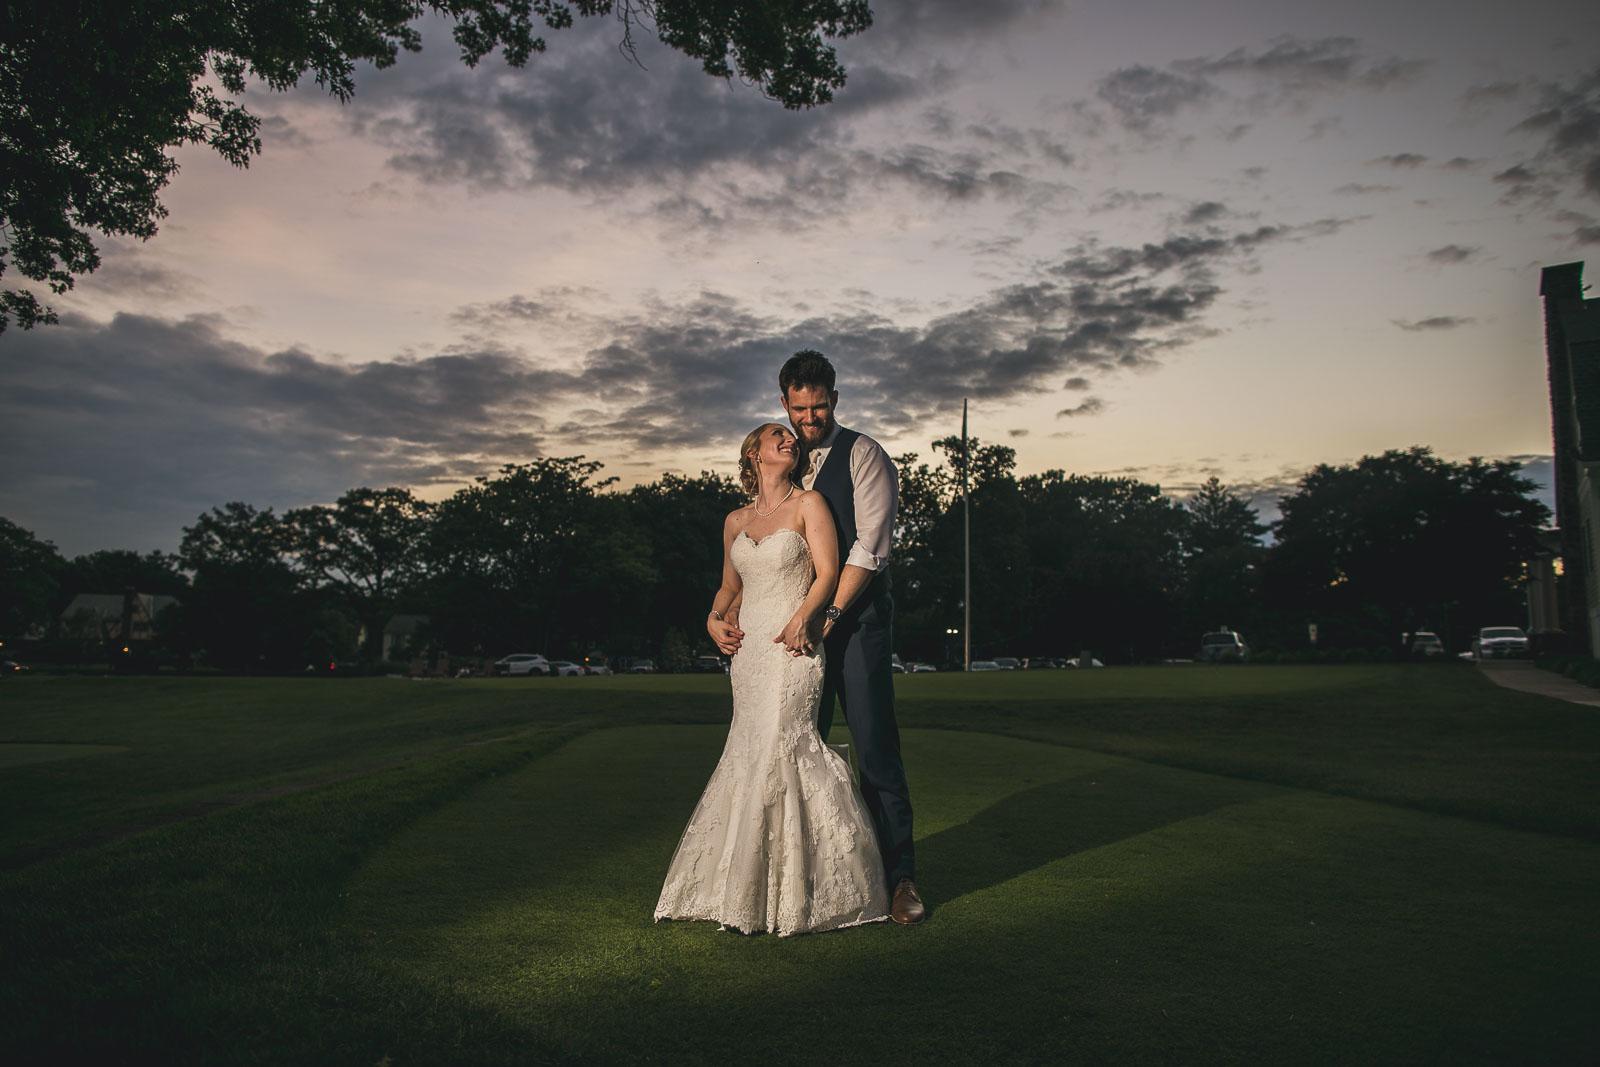 Creative Night Time Wedding Photography